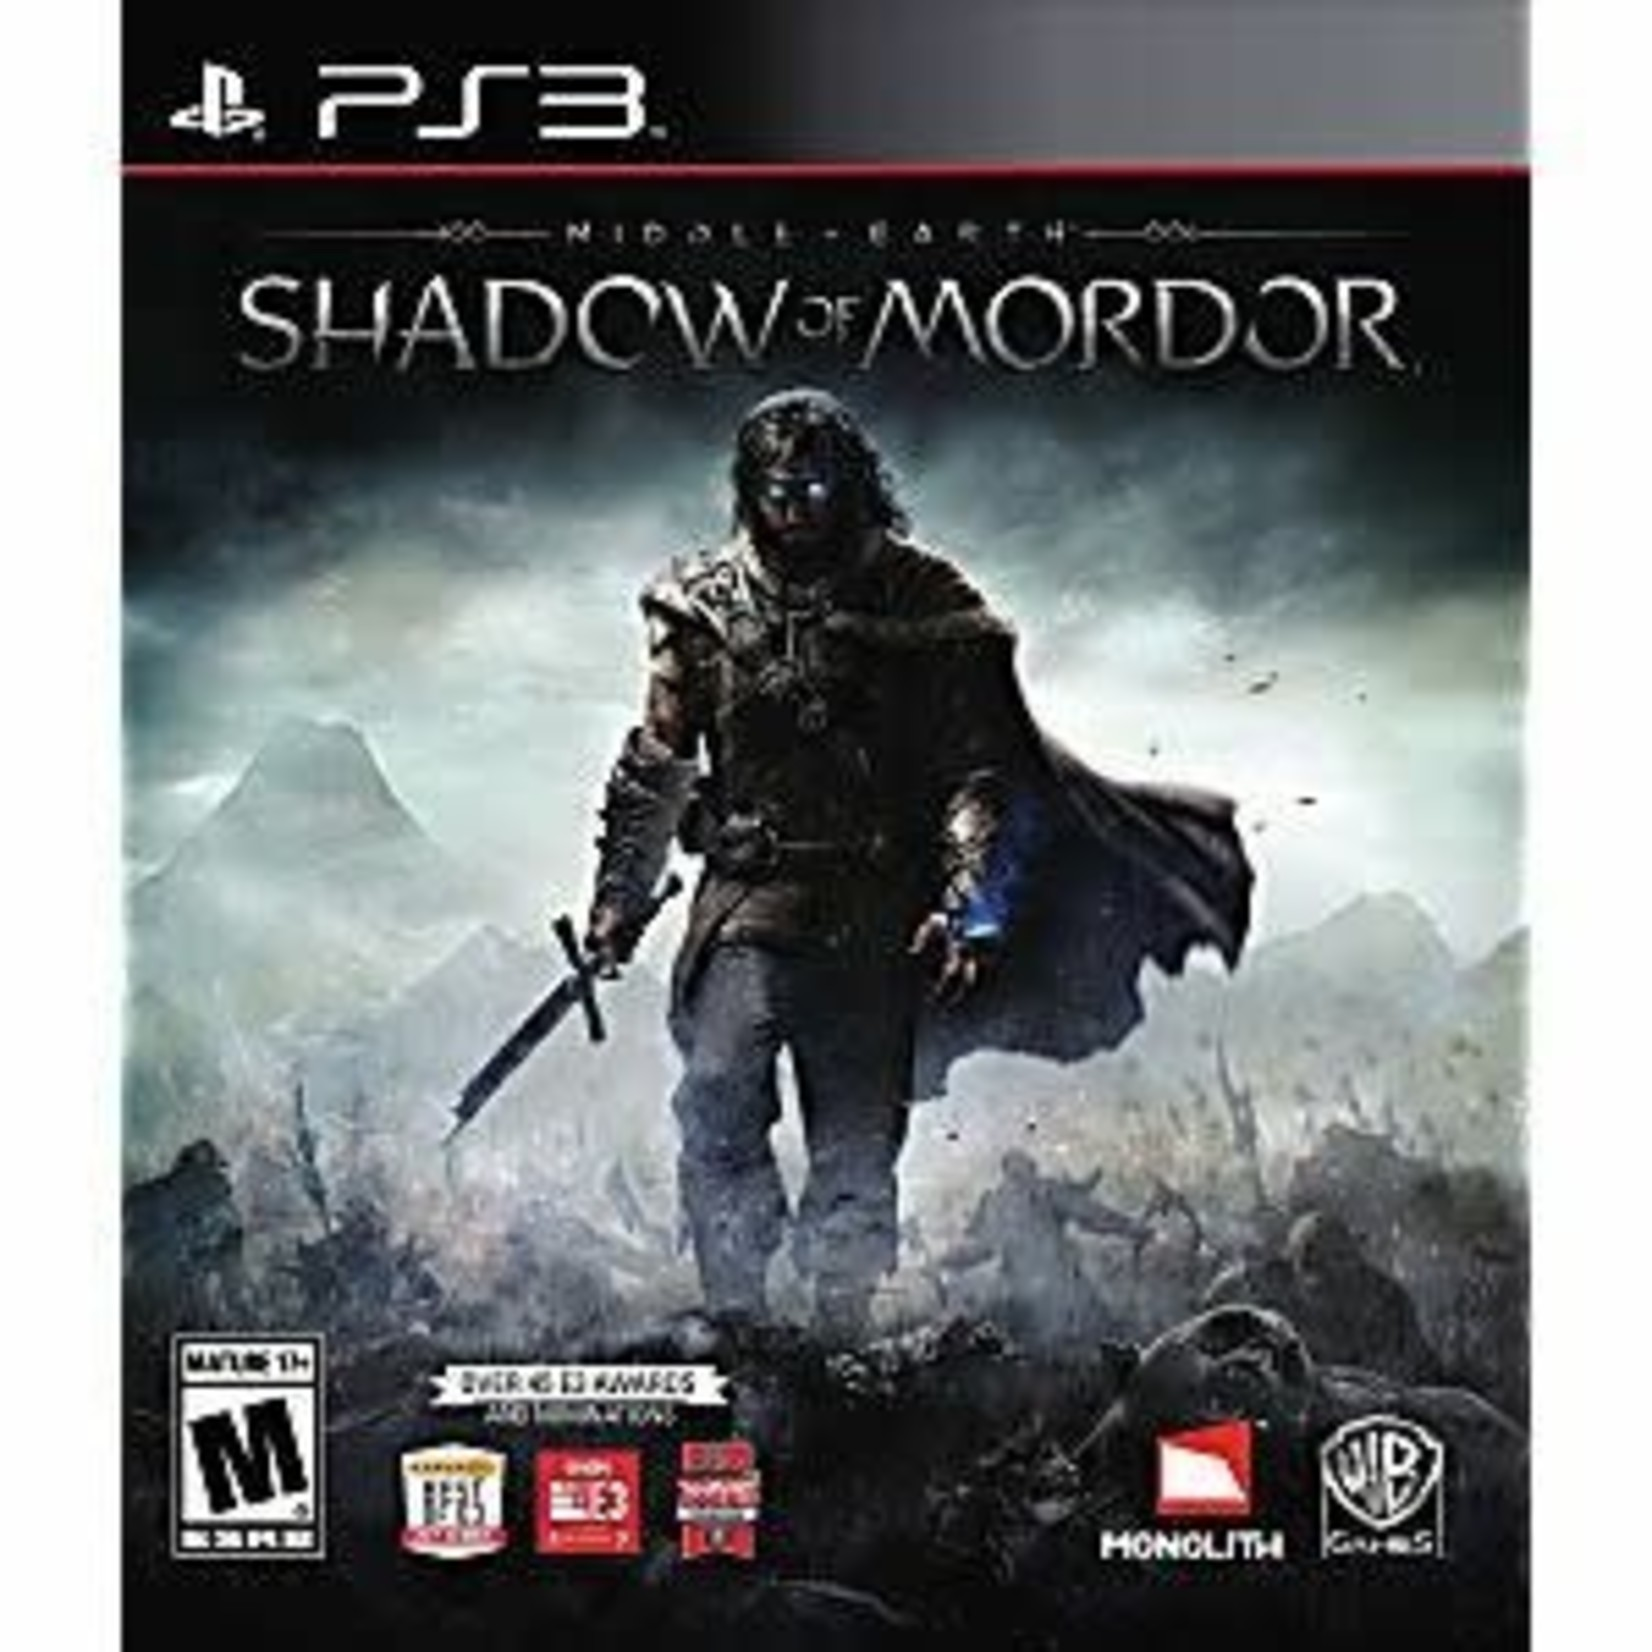 PS3U-Middle-earth: Shadow of Mordor